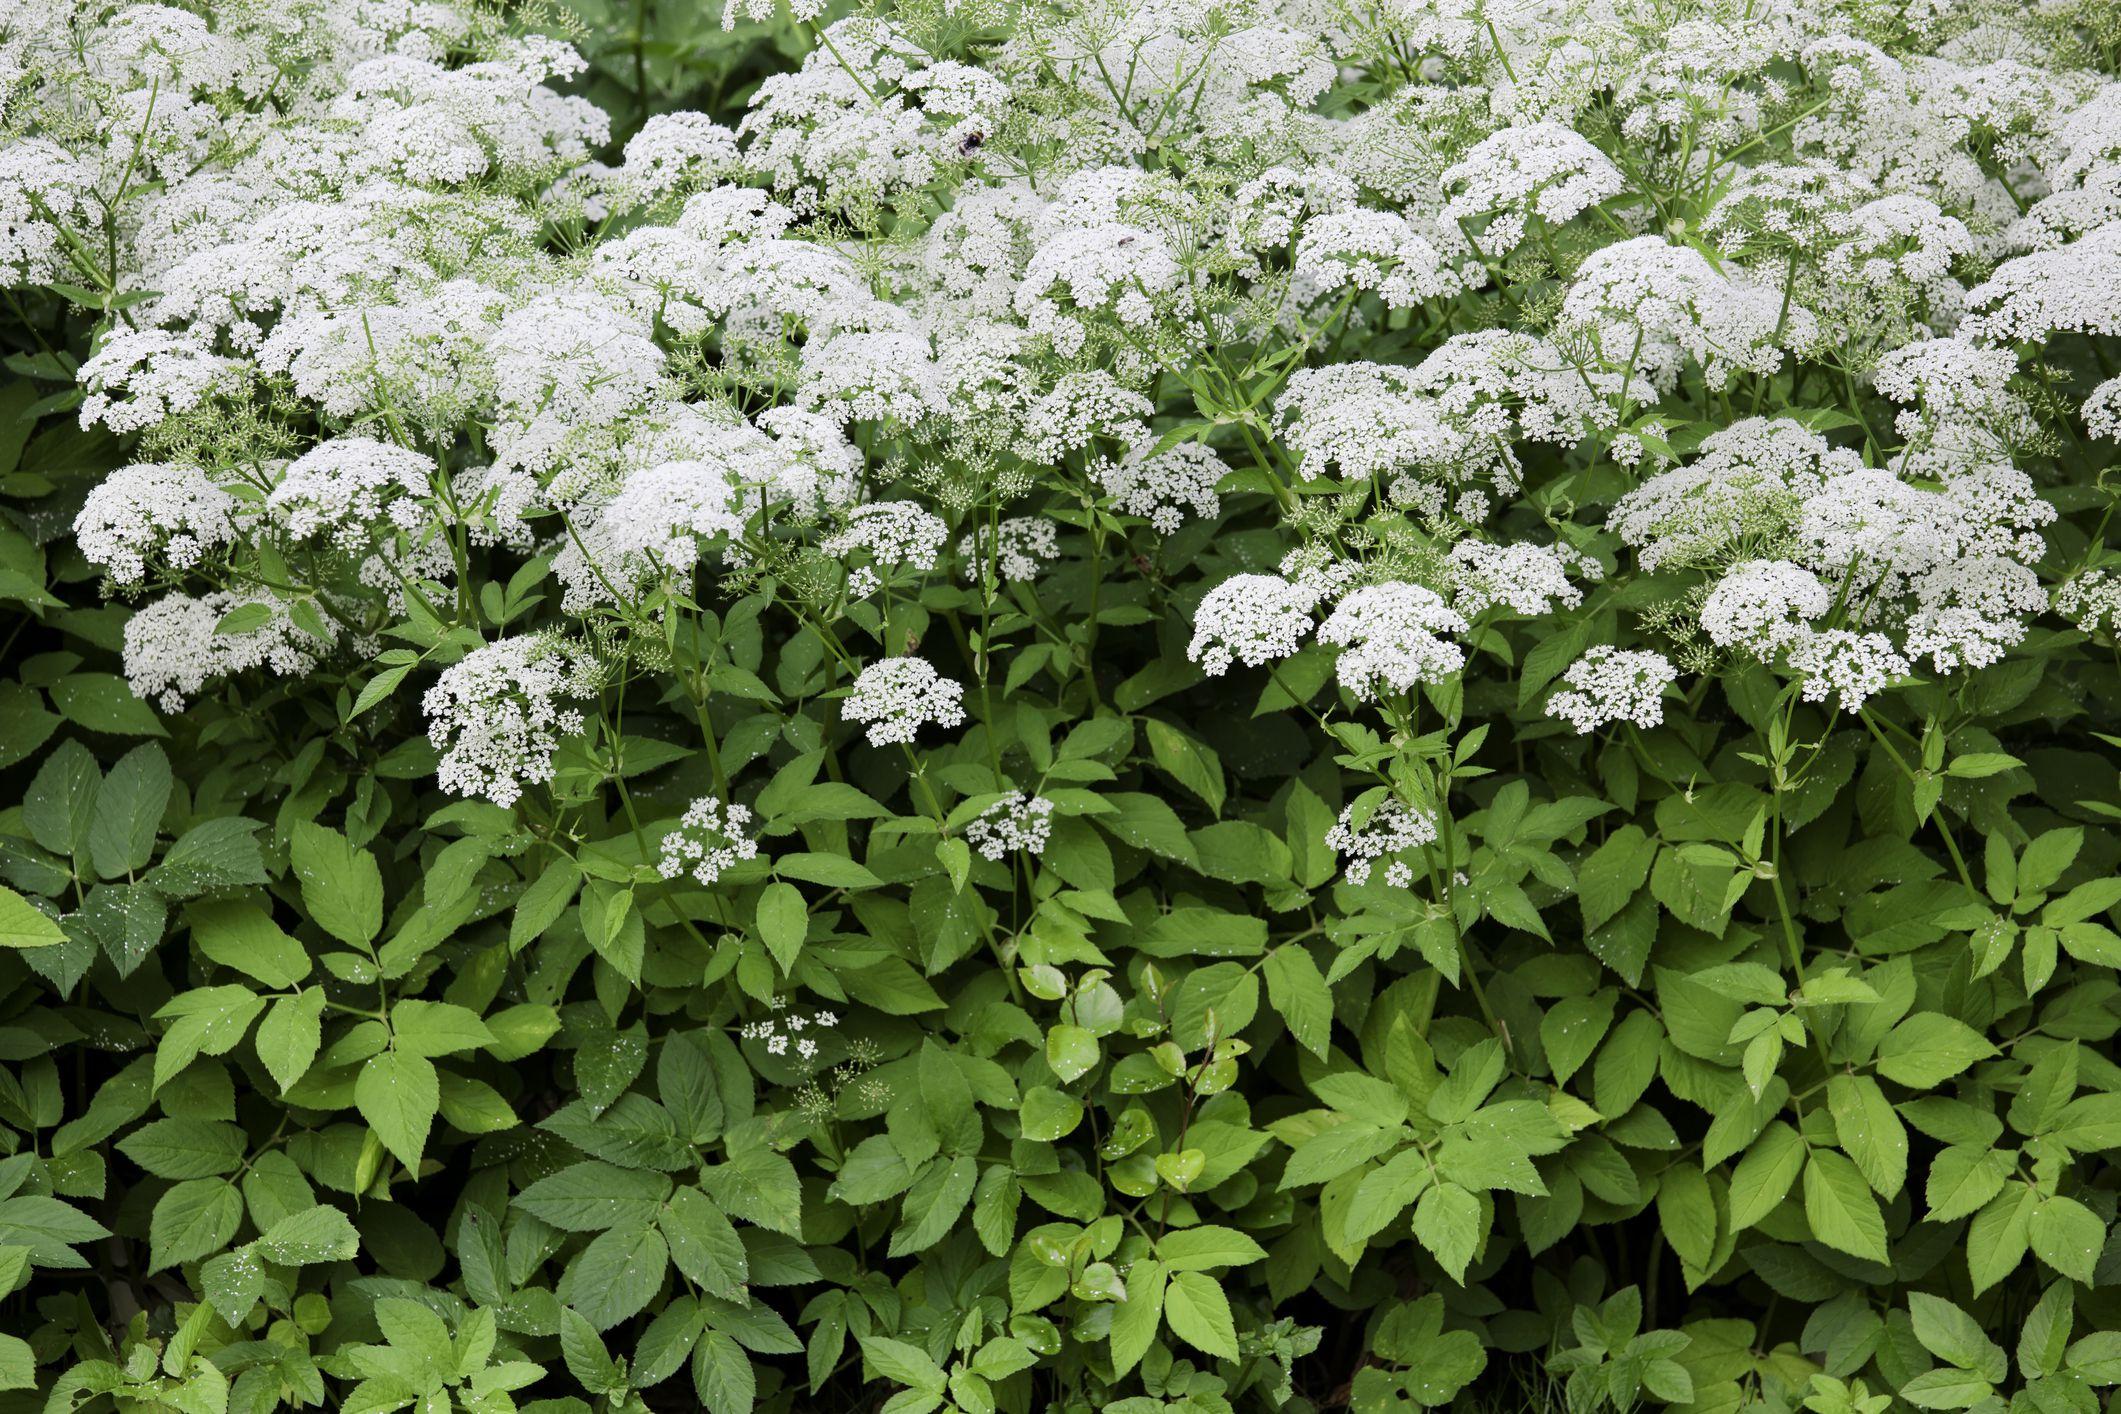 Plants that can cause skin irritations bishops weed aegopodium podagraria mightylinksfo